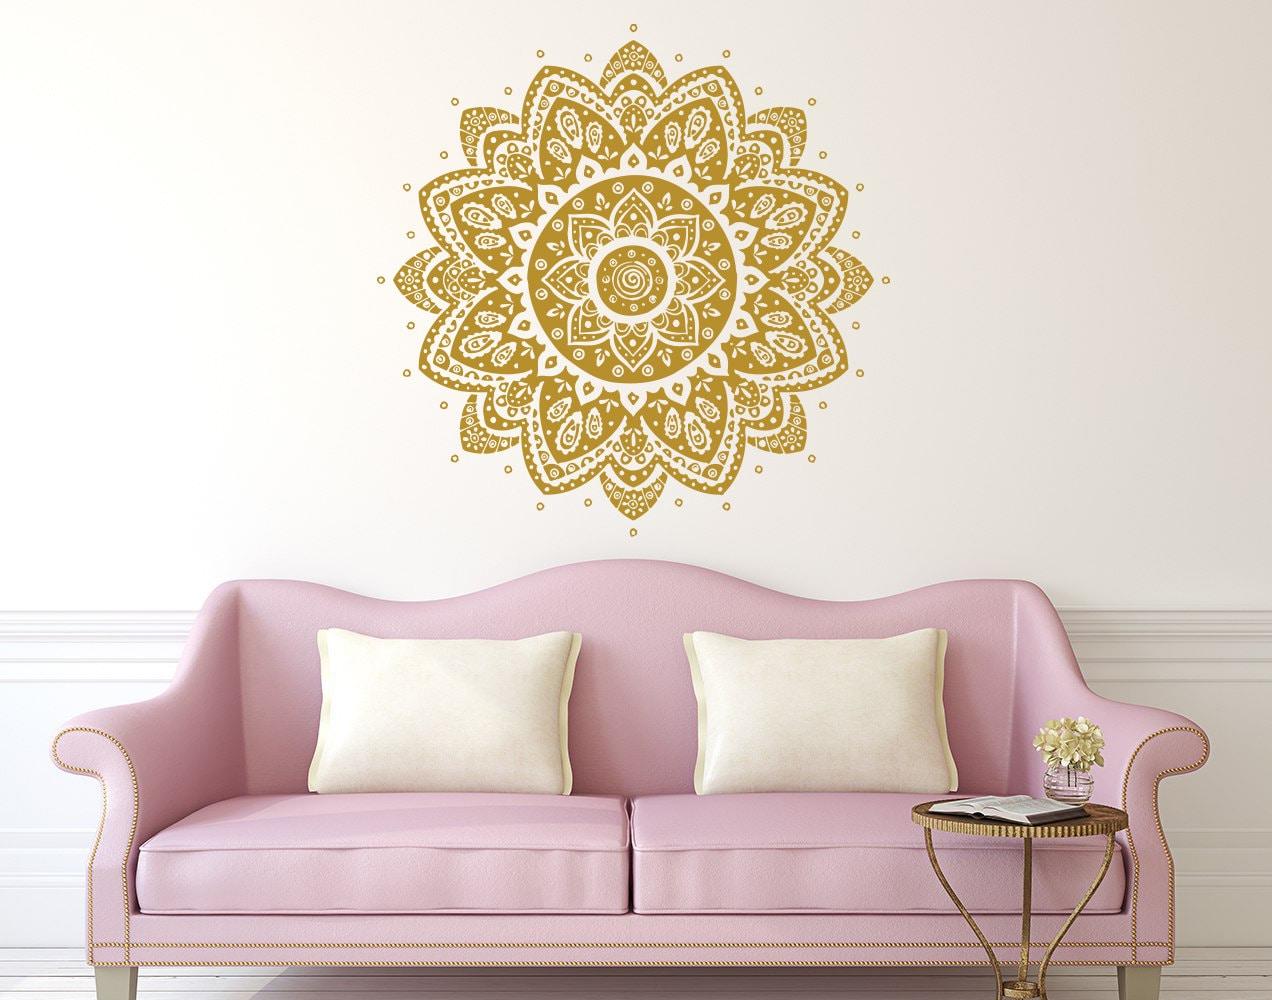 Wall decal mandala vinyl sticker decals lotus flower home - Stickers para decorar paredes ...